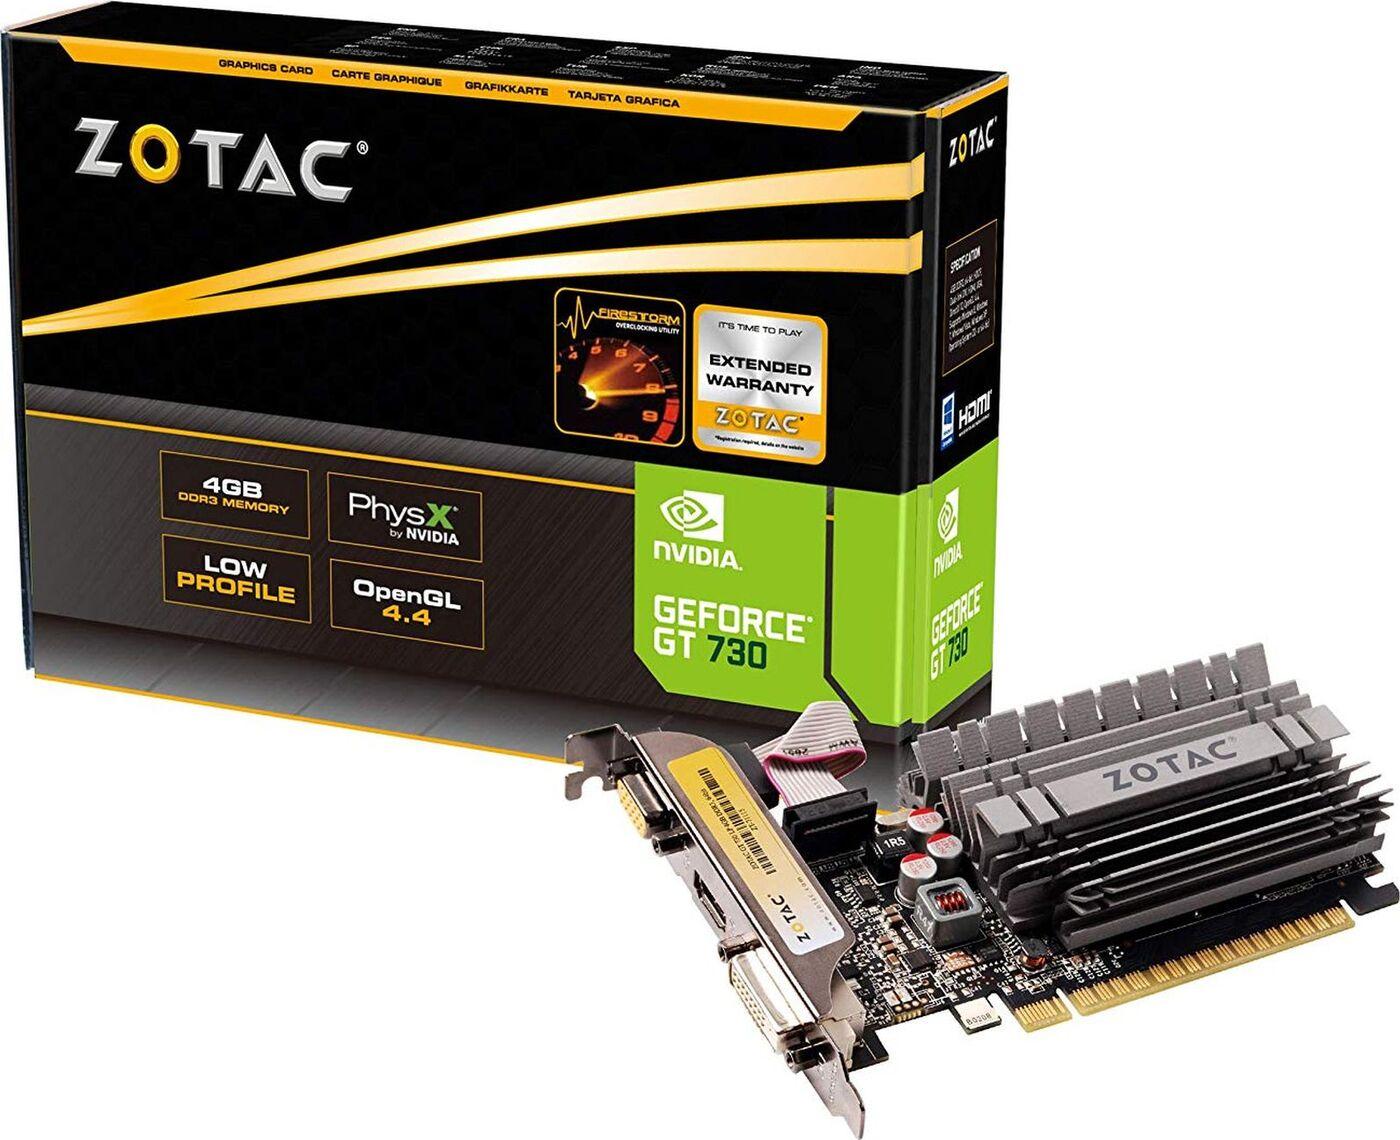 Видеокарта Zotac Zone Edition GeForce GT 730 4GB, ZT-71115-20L